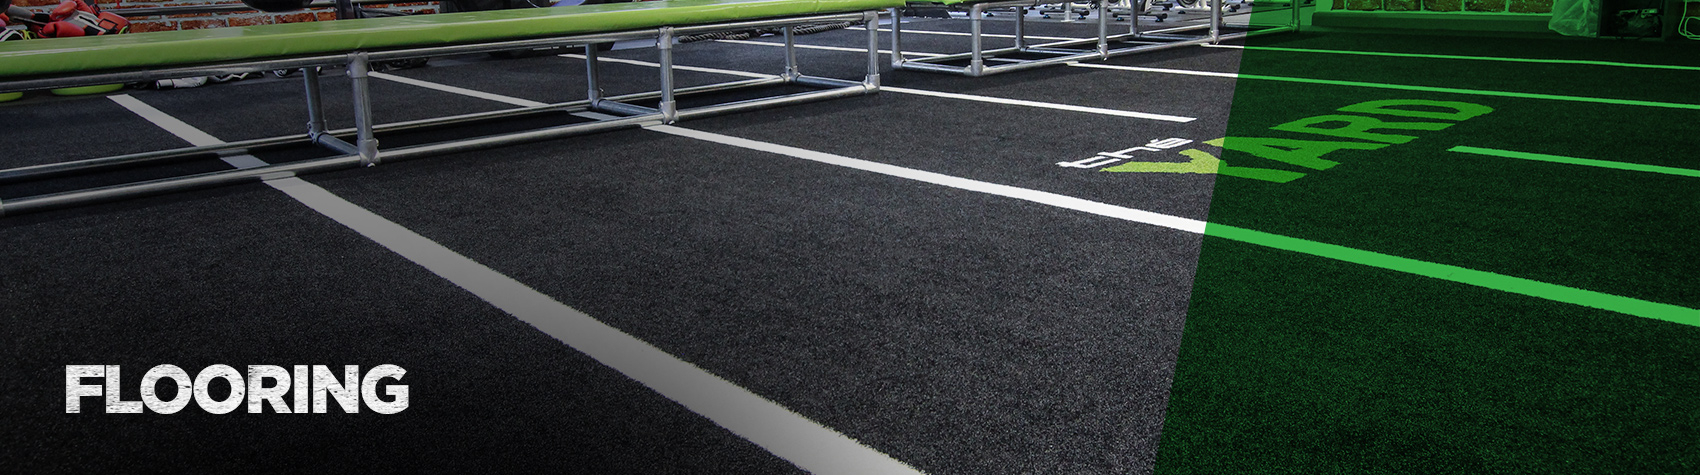 Flooring Category